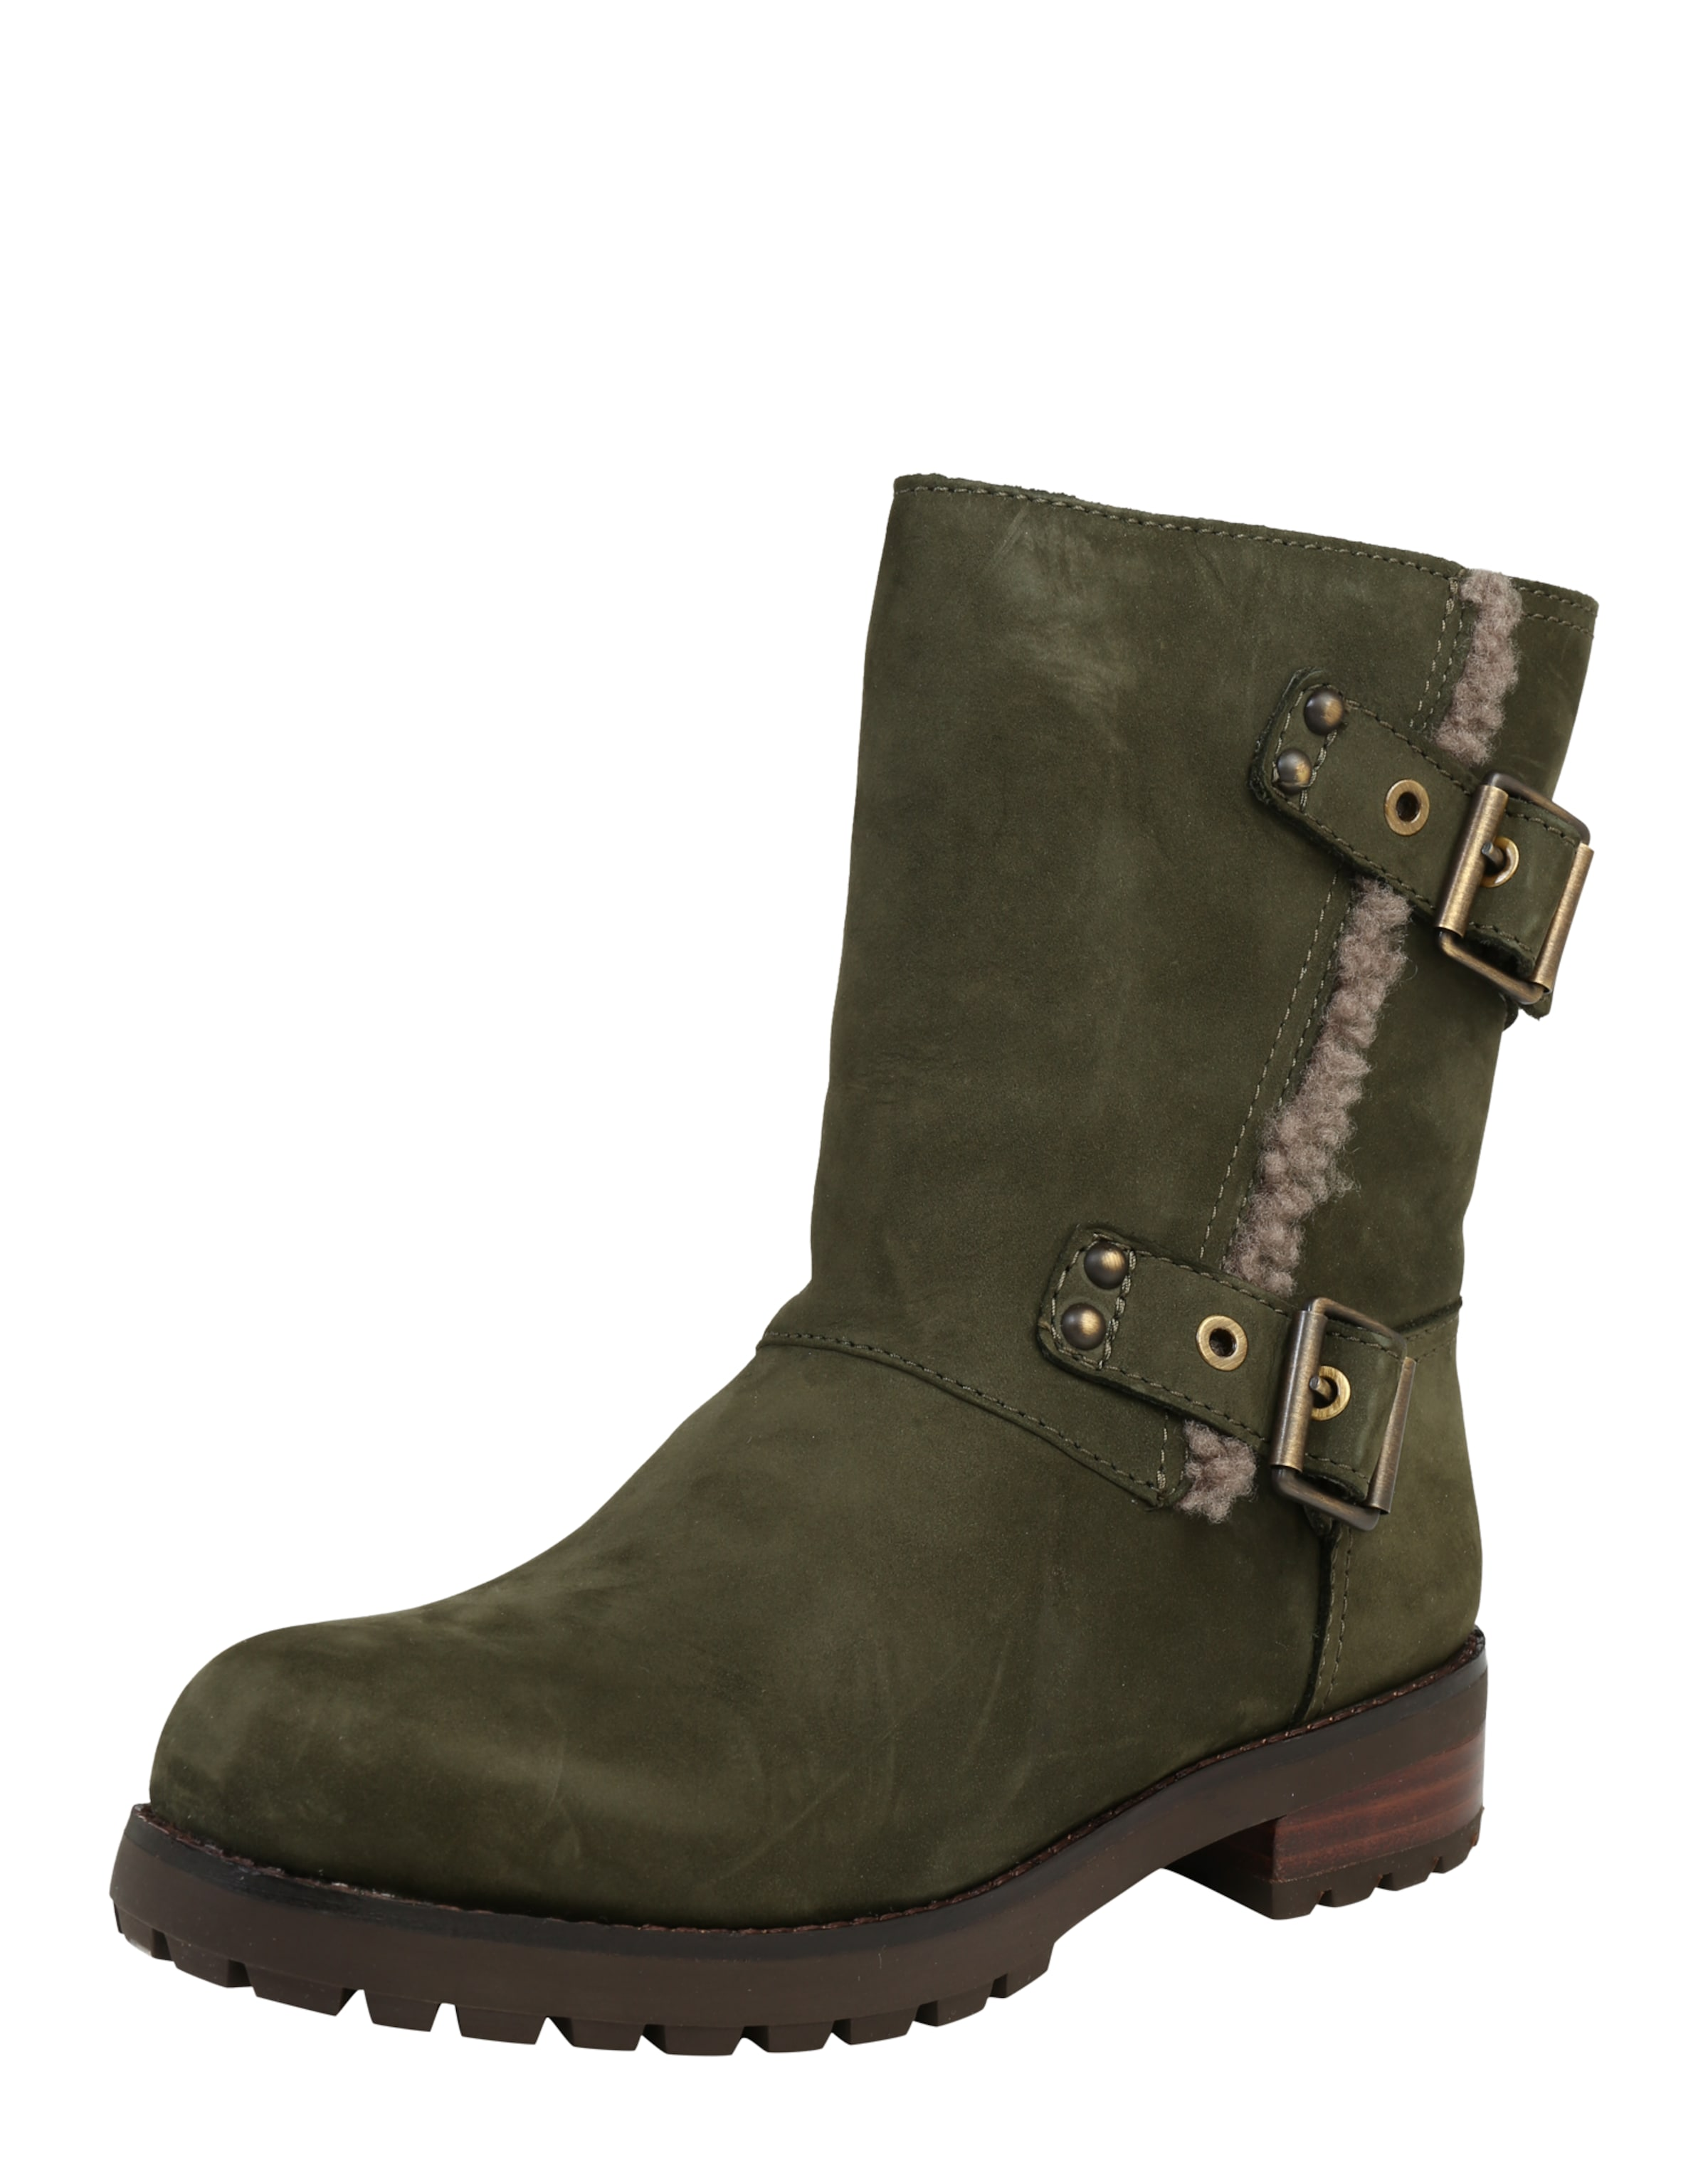 UGG Damen Boots Bailey Button Poppy 1092294-SLPN 38 gZwbiQK